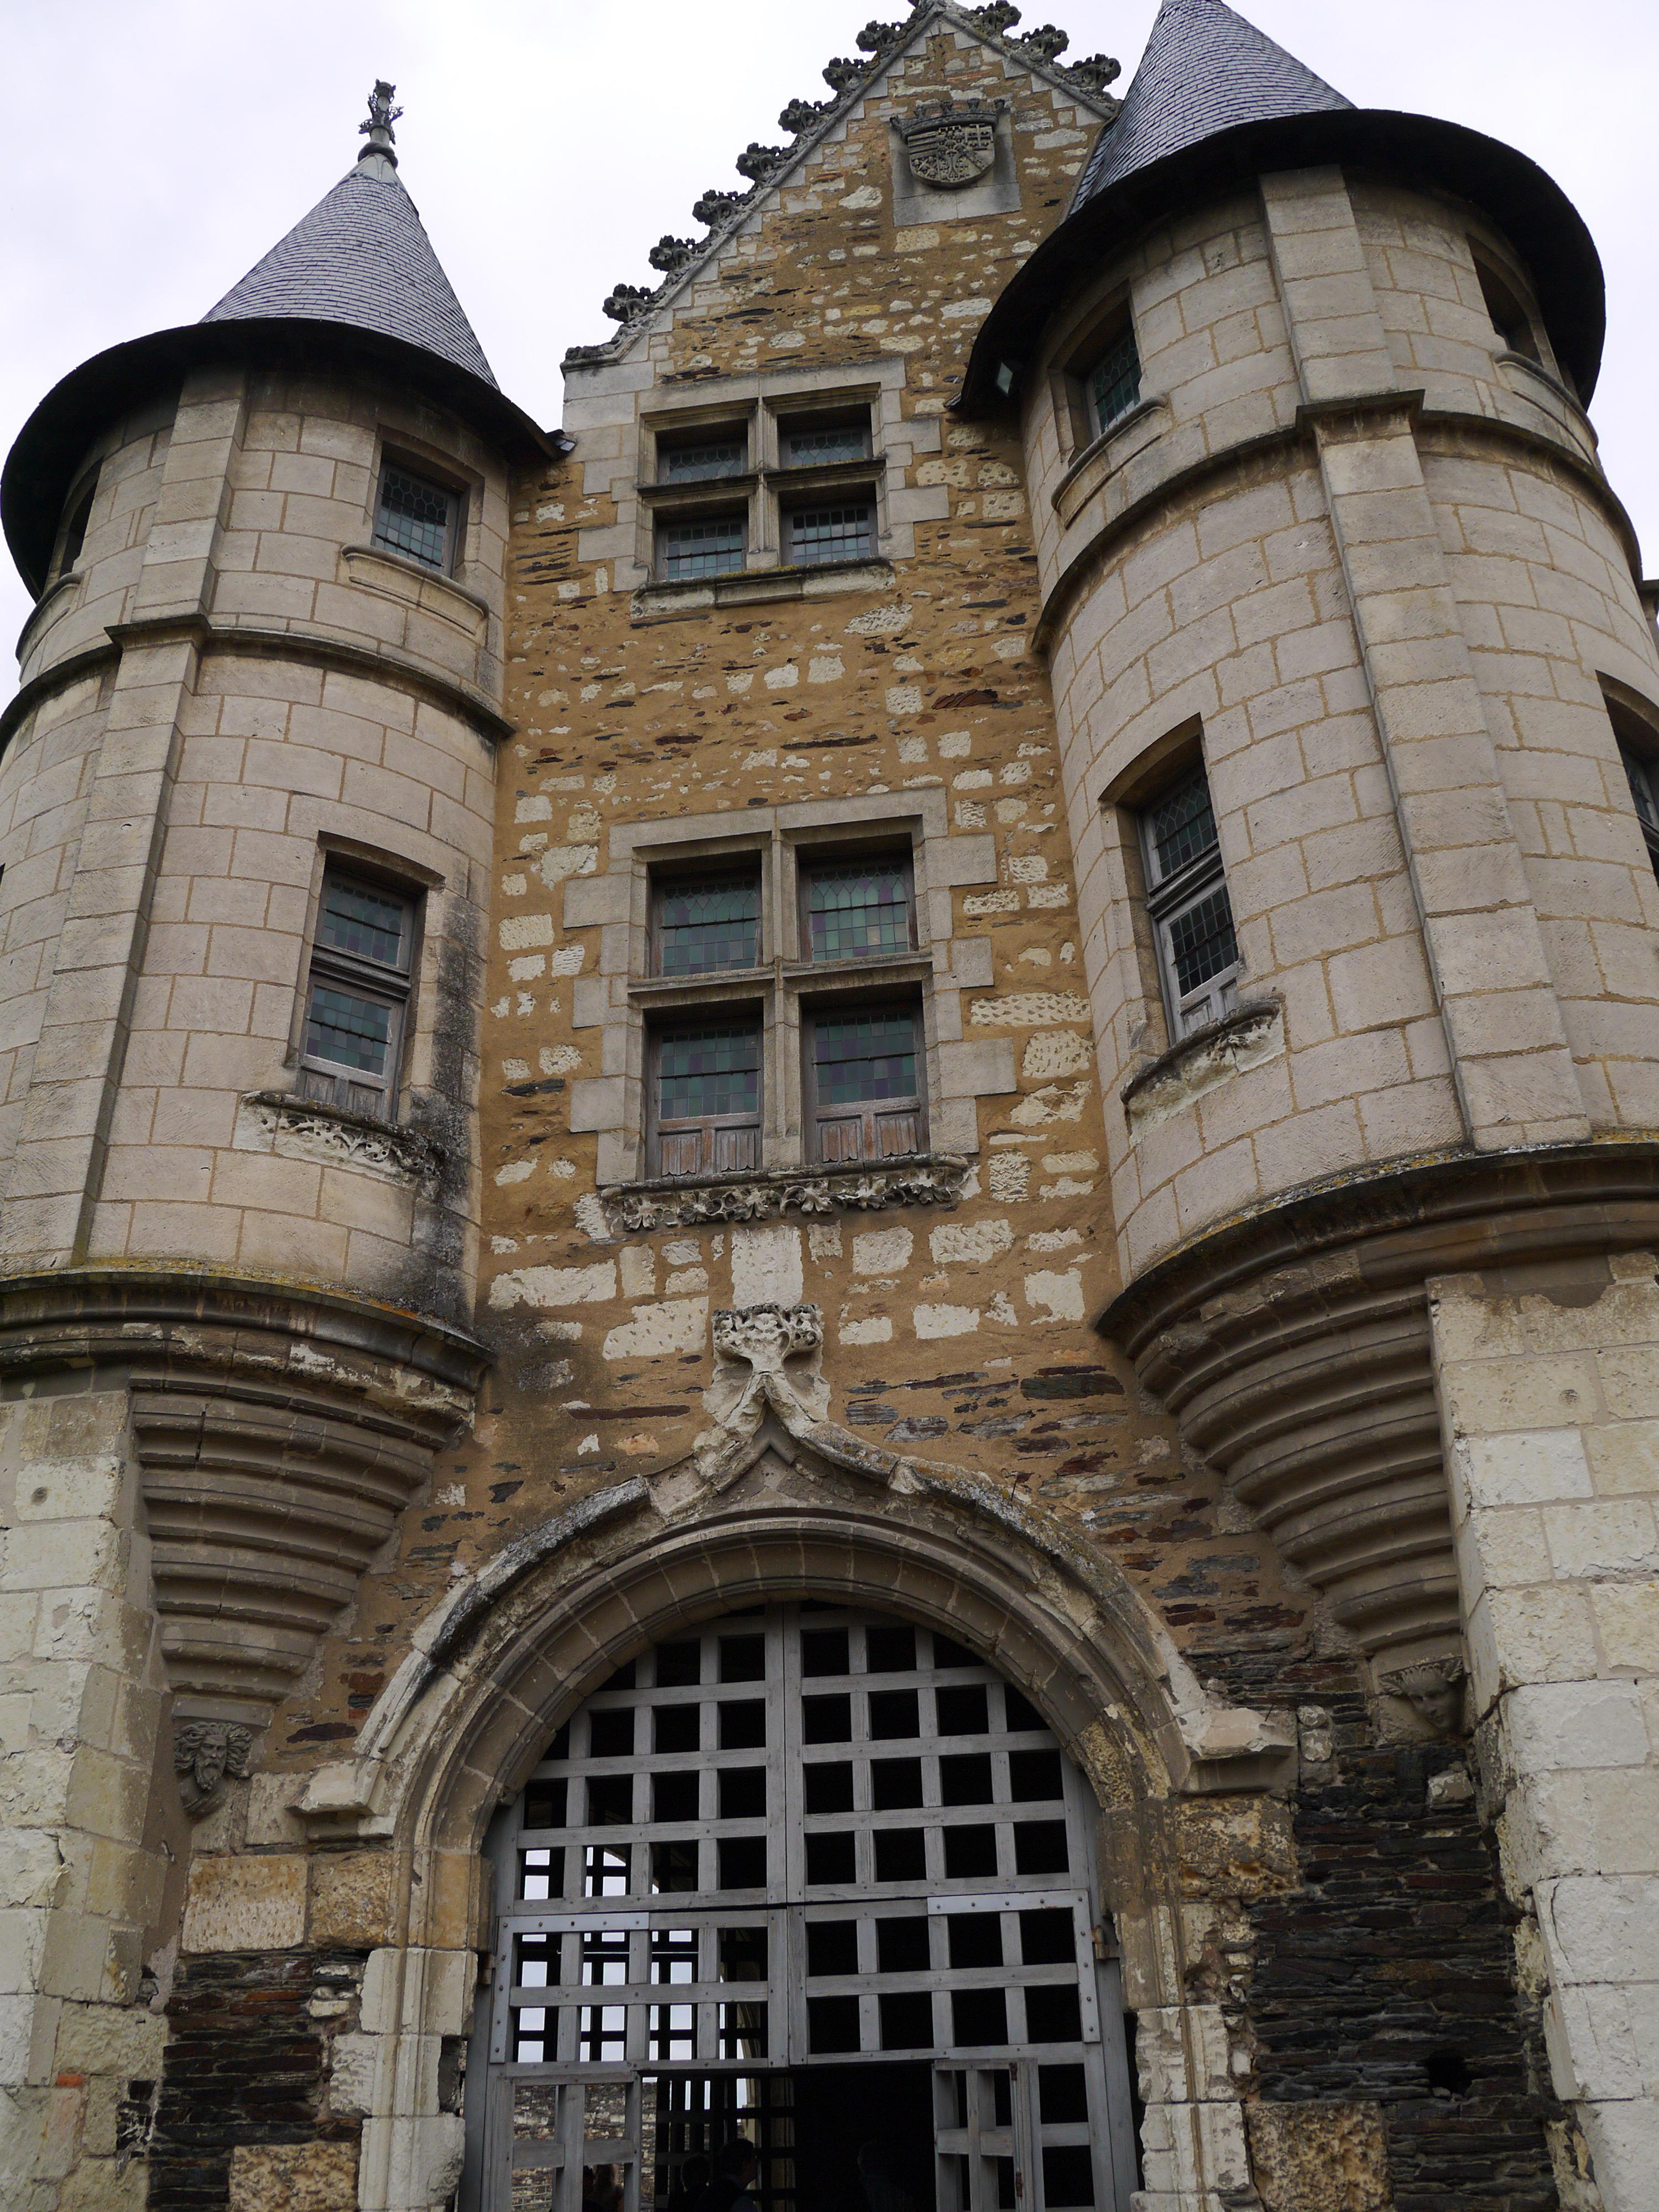 Angers chateau and maison des vin for Maison atypique angers